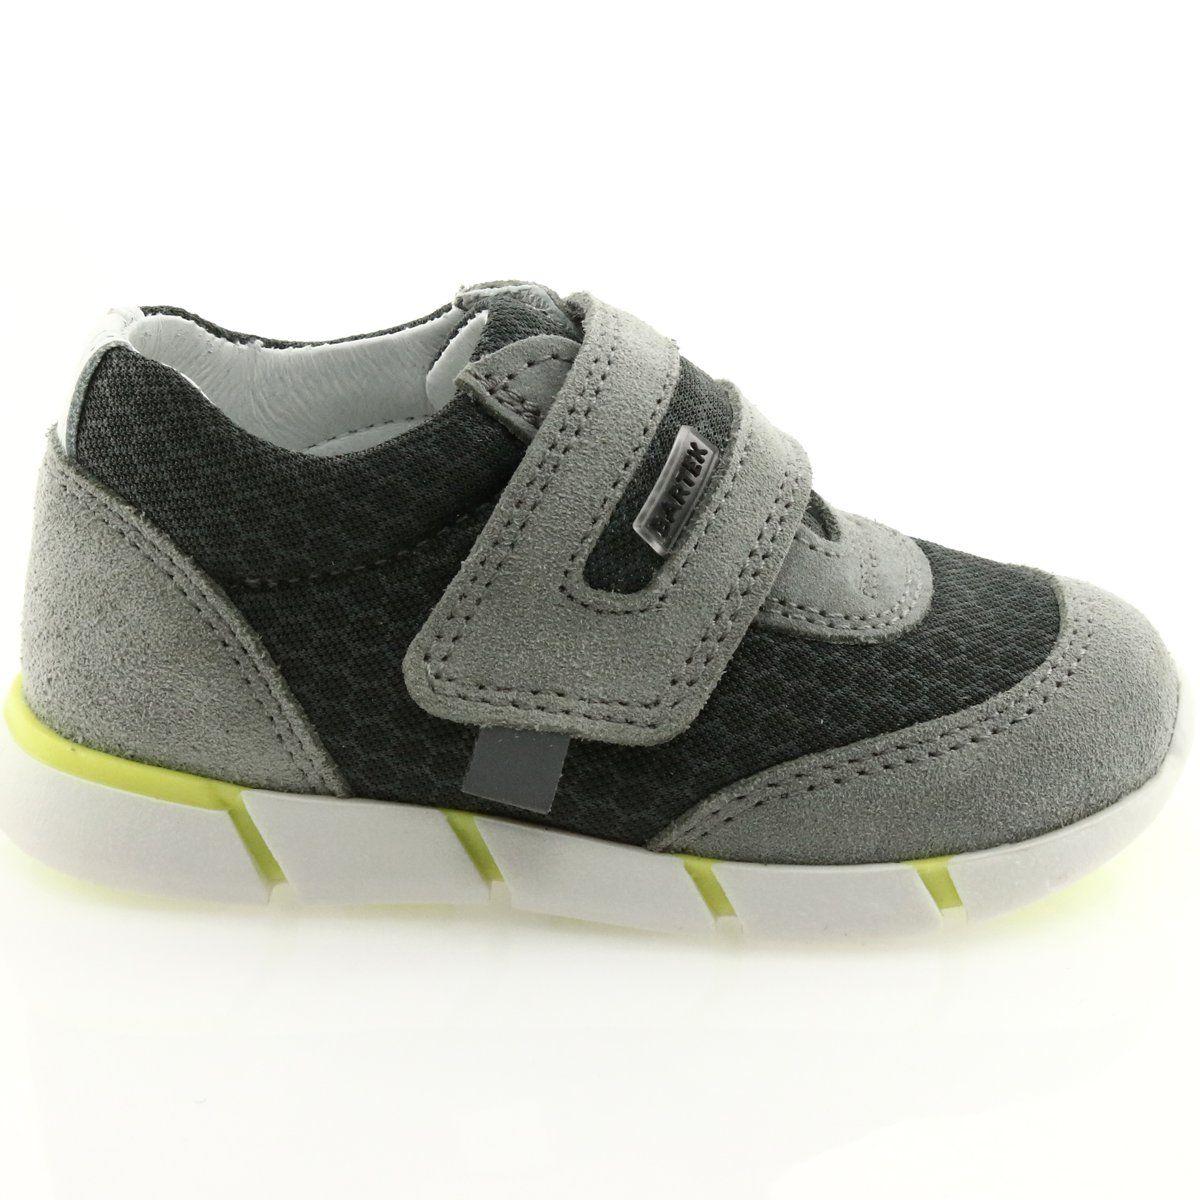 Buty Sportowe Na Rzep Bartek 51949 Szare Shoes Baby Shoes Sneakers